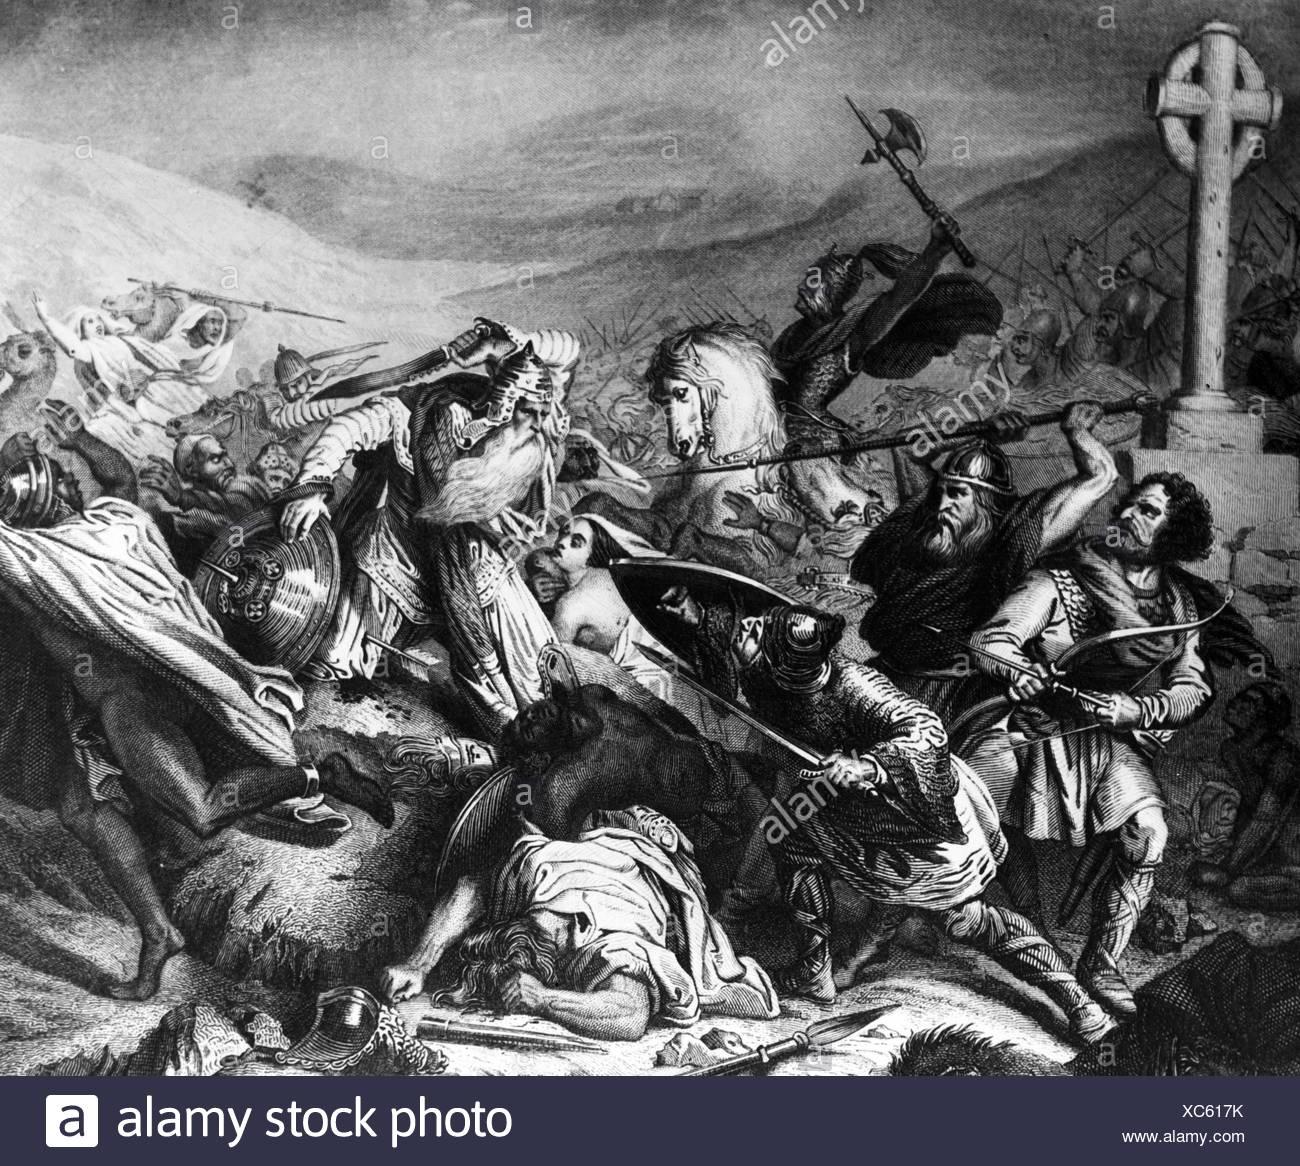 Battle scene - Stock Image